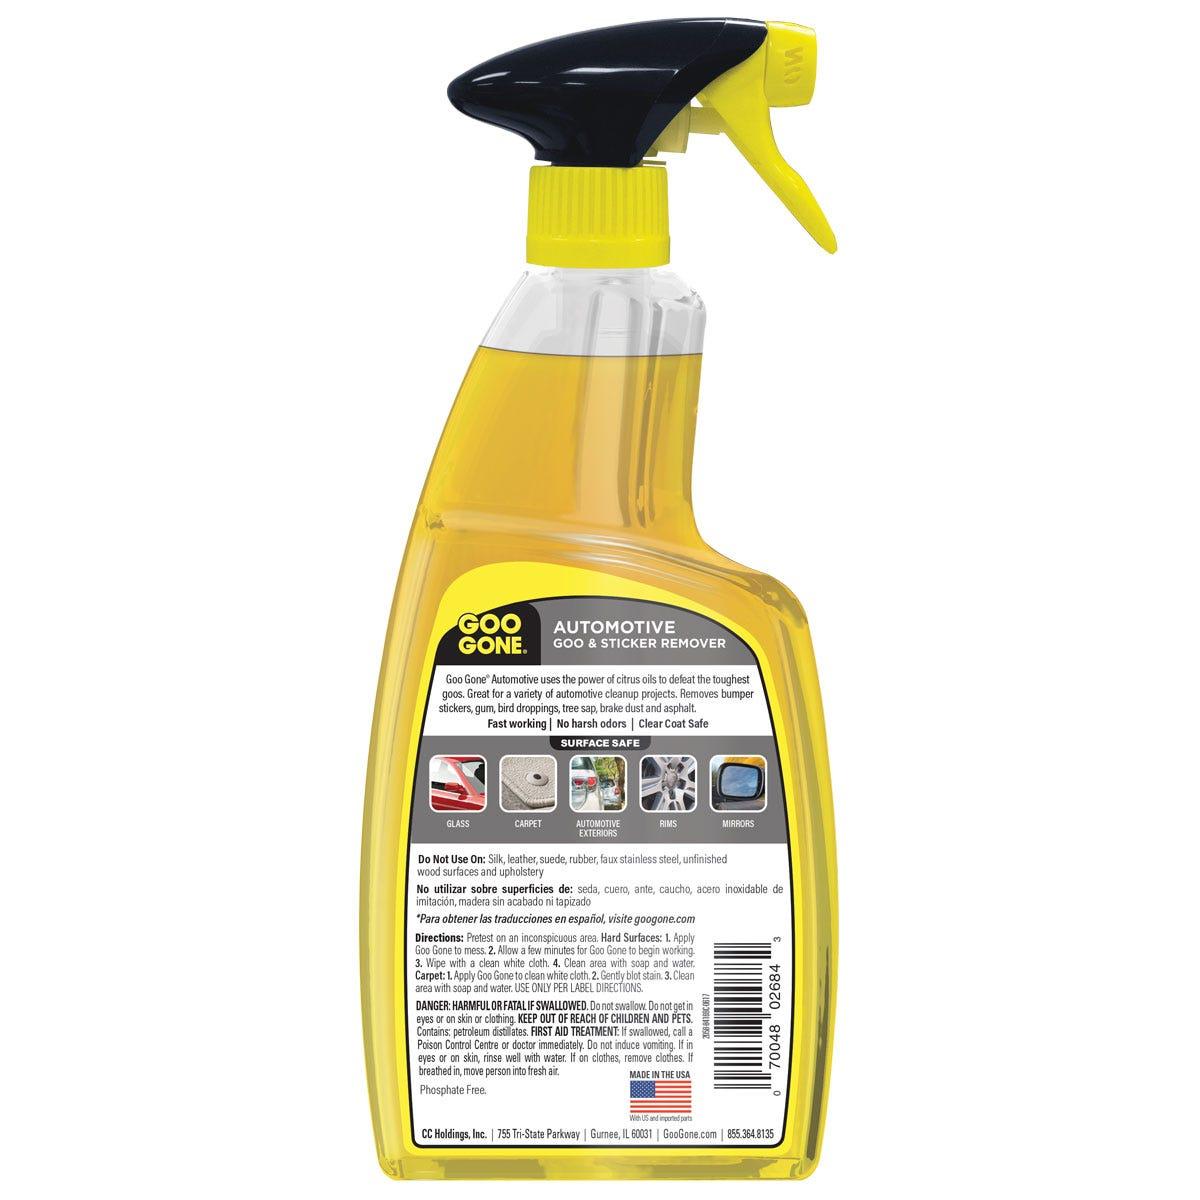 https://googone.com/media/catalog/product/g/o/goo-gone-automotive-spray_back.jpg